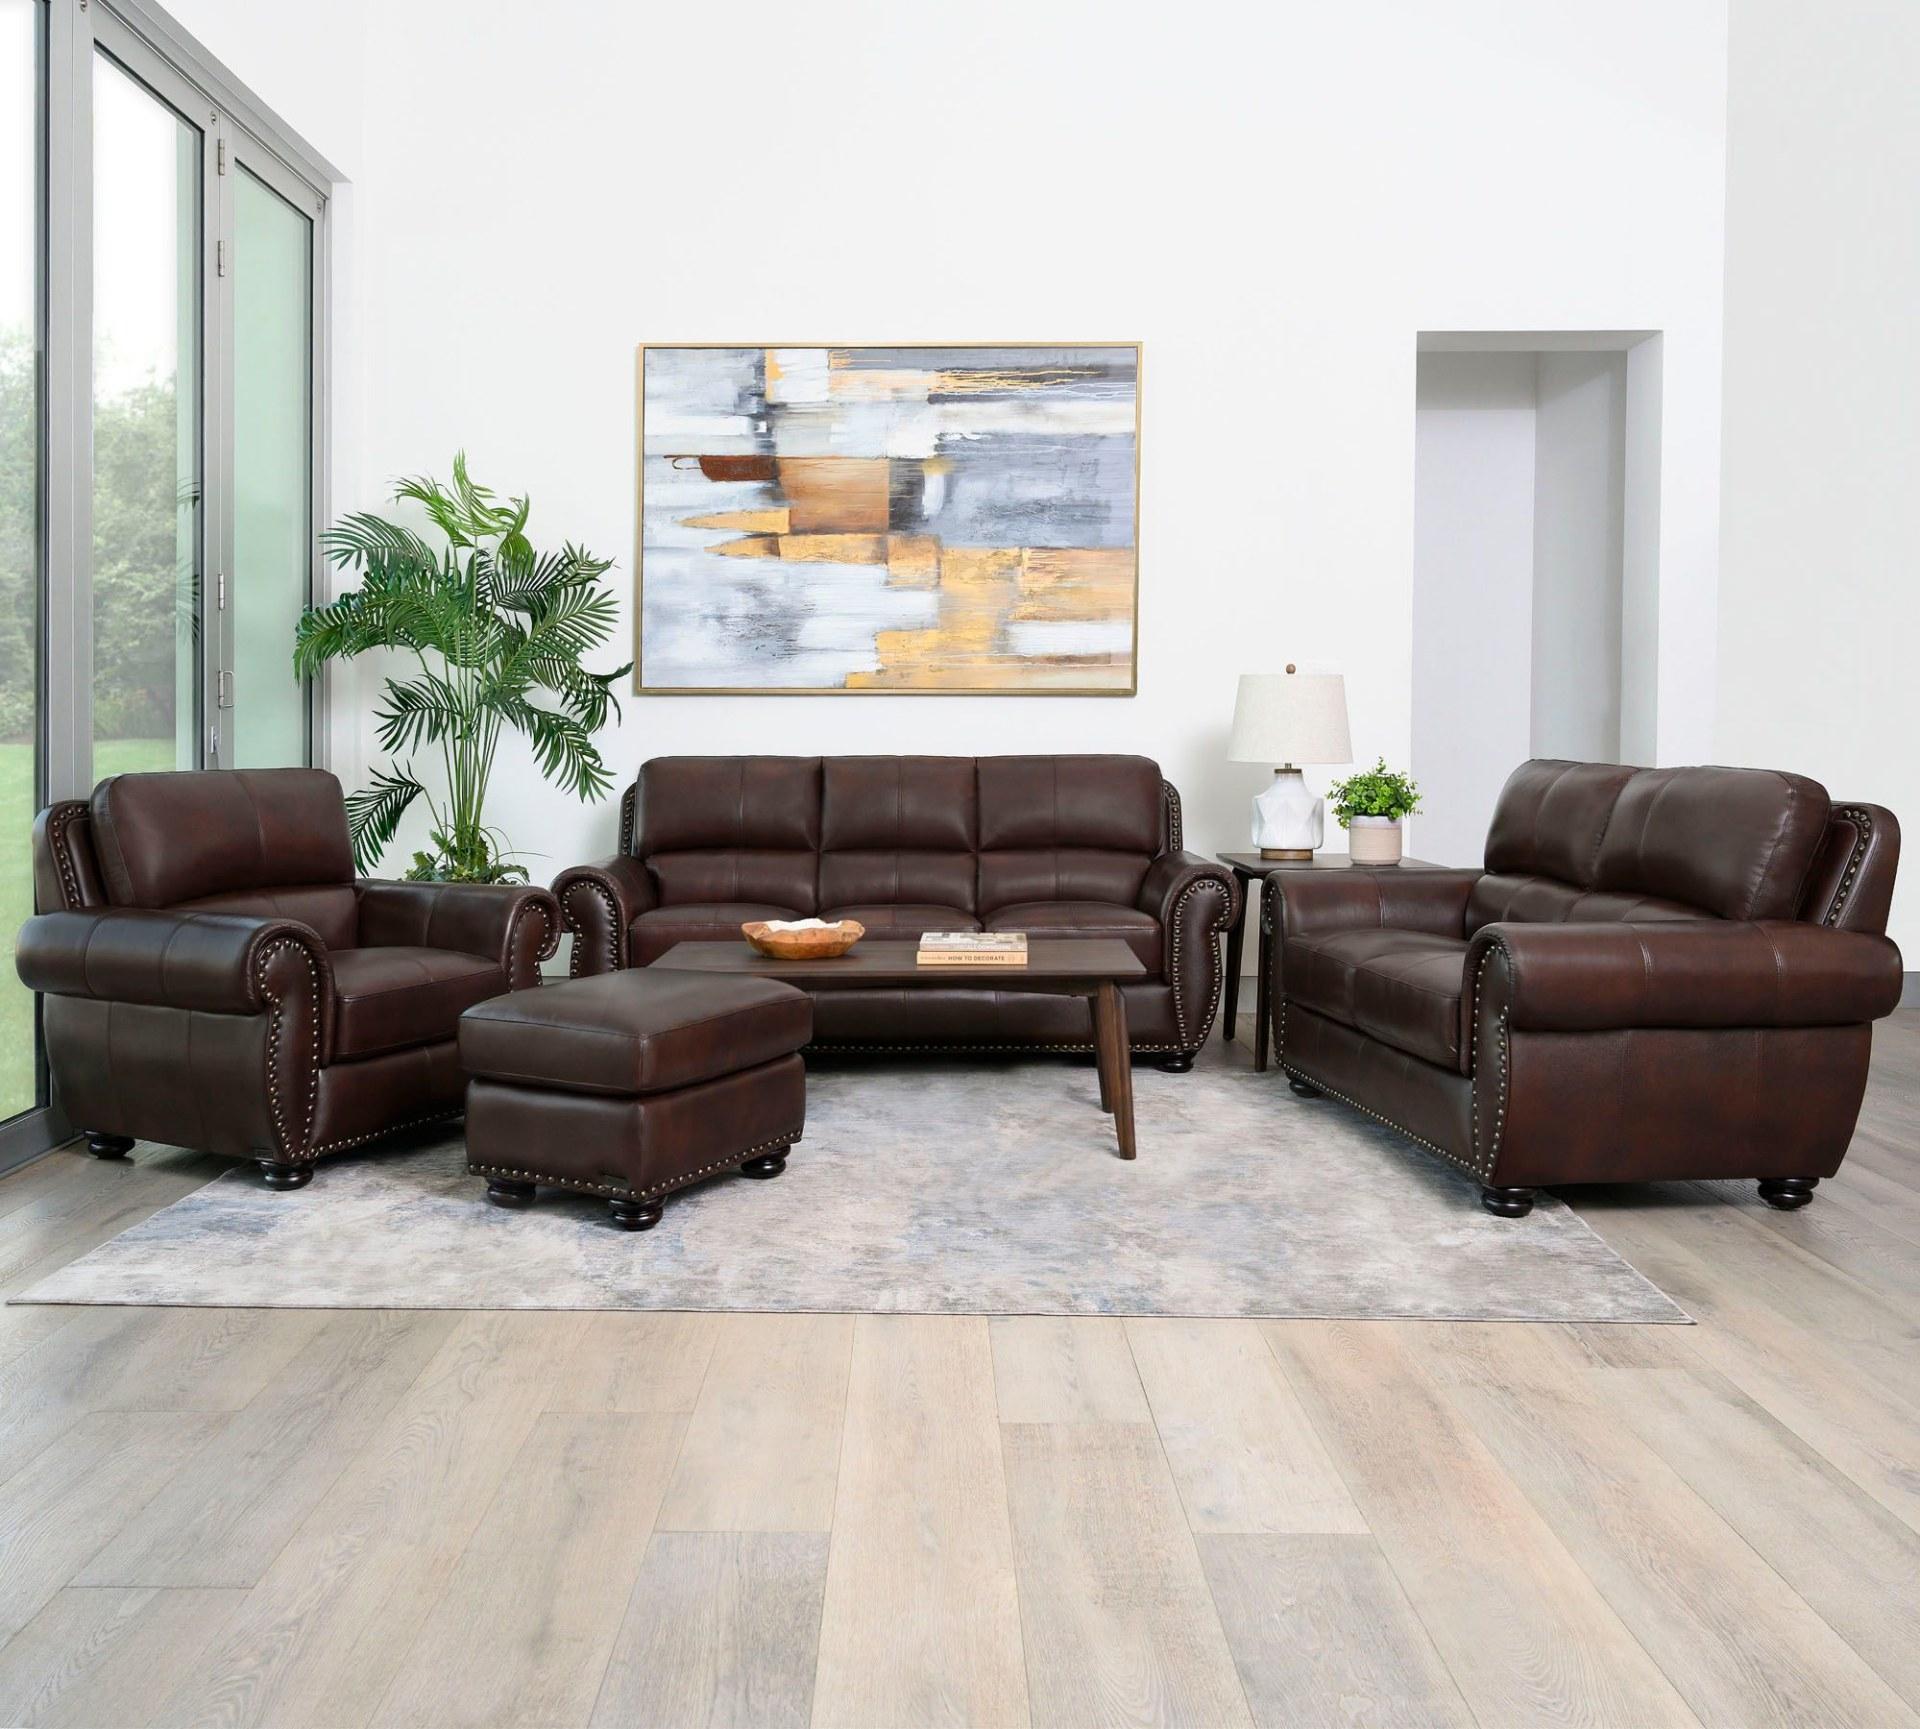 Austin 4 Piece Top Grain Leather Living, Living Room Set